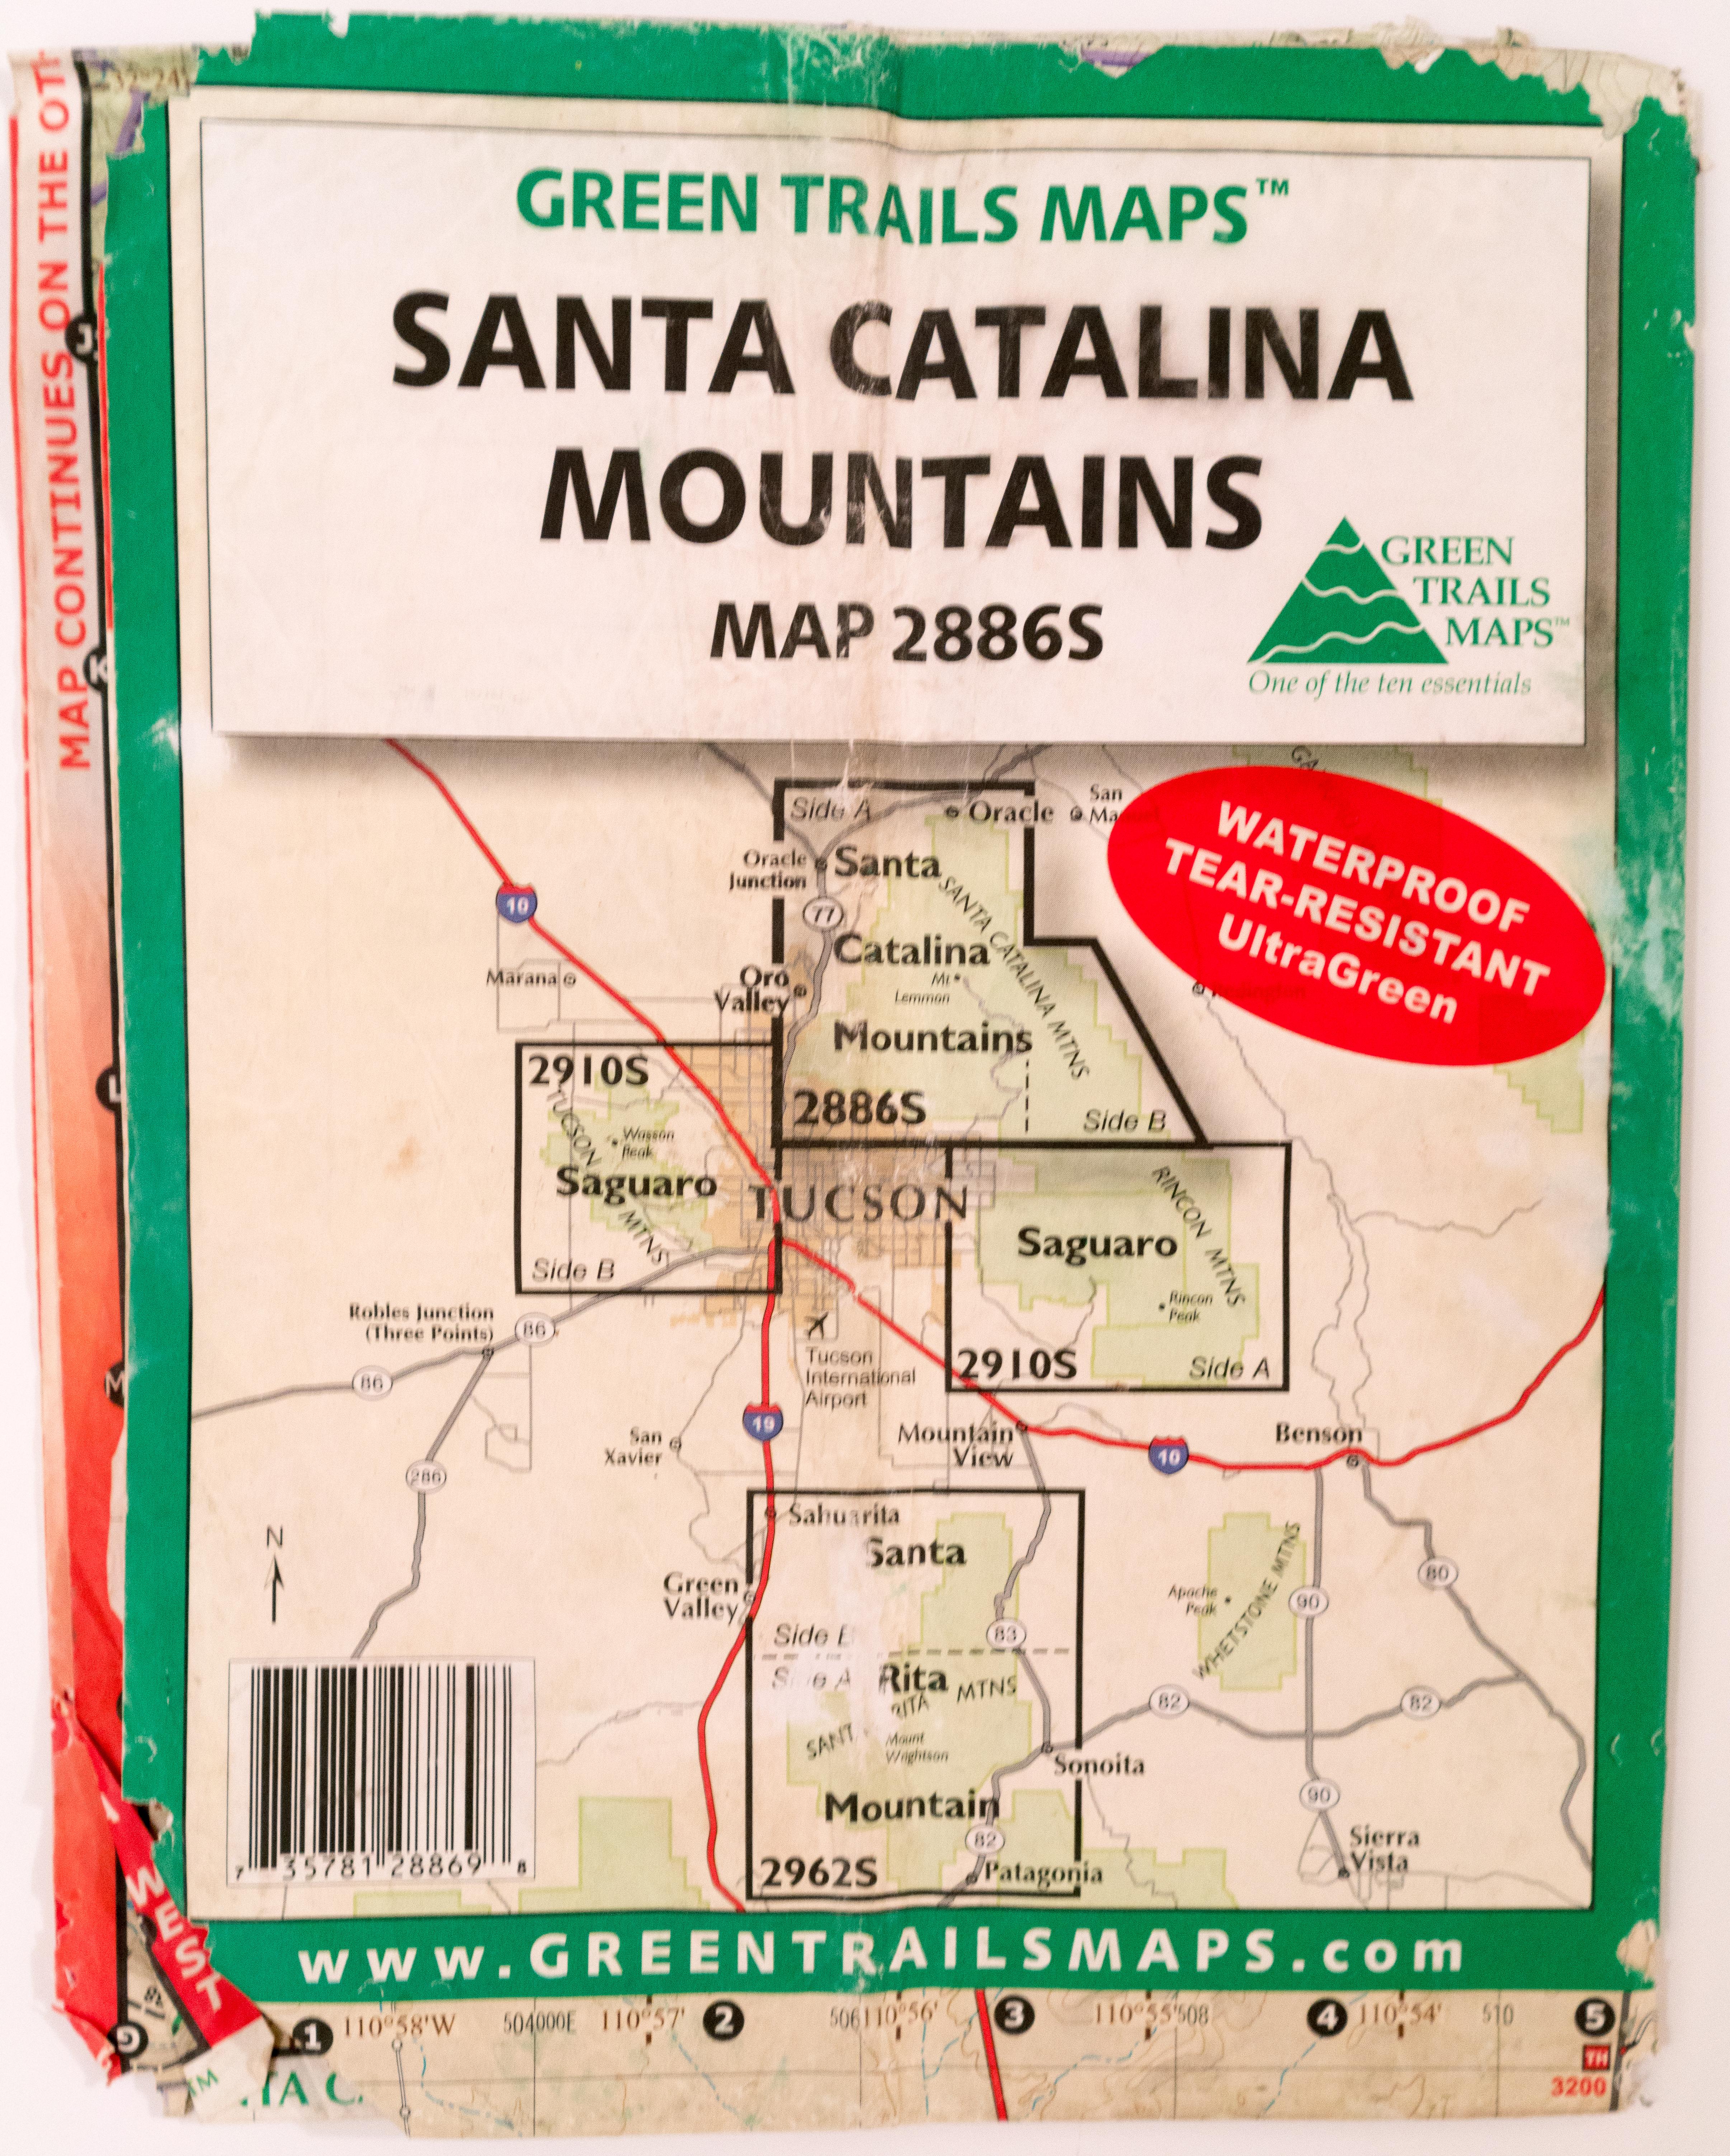 Green Trails Santa Catalina Mountains Map Hike Lemmon